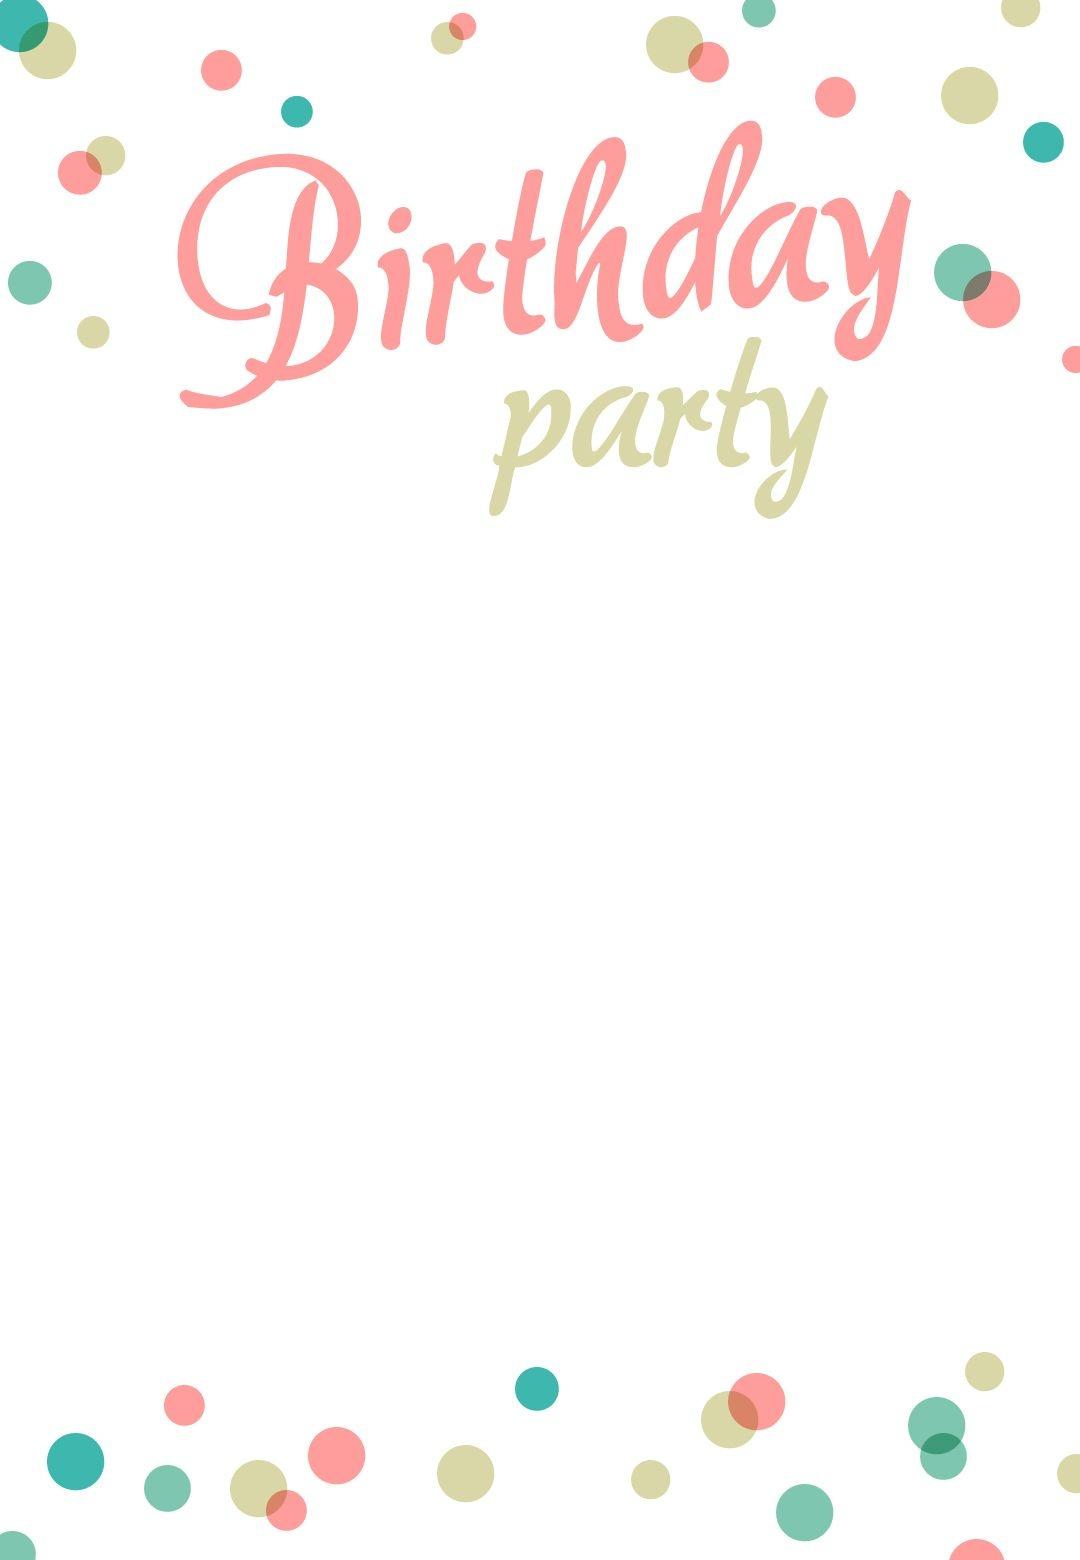 Birthday Party Dots - Free Printable Birthday Invitation Template - Customized Birthday Cards Free Printable